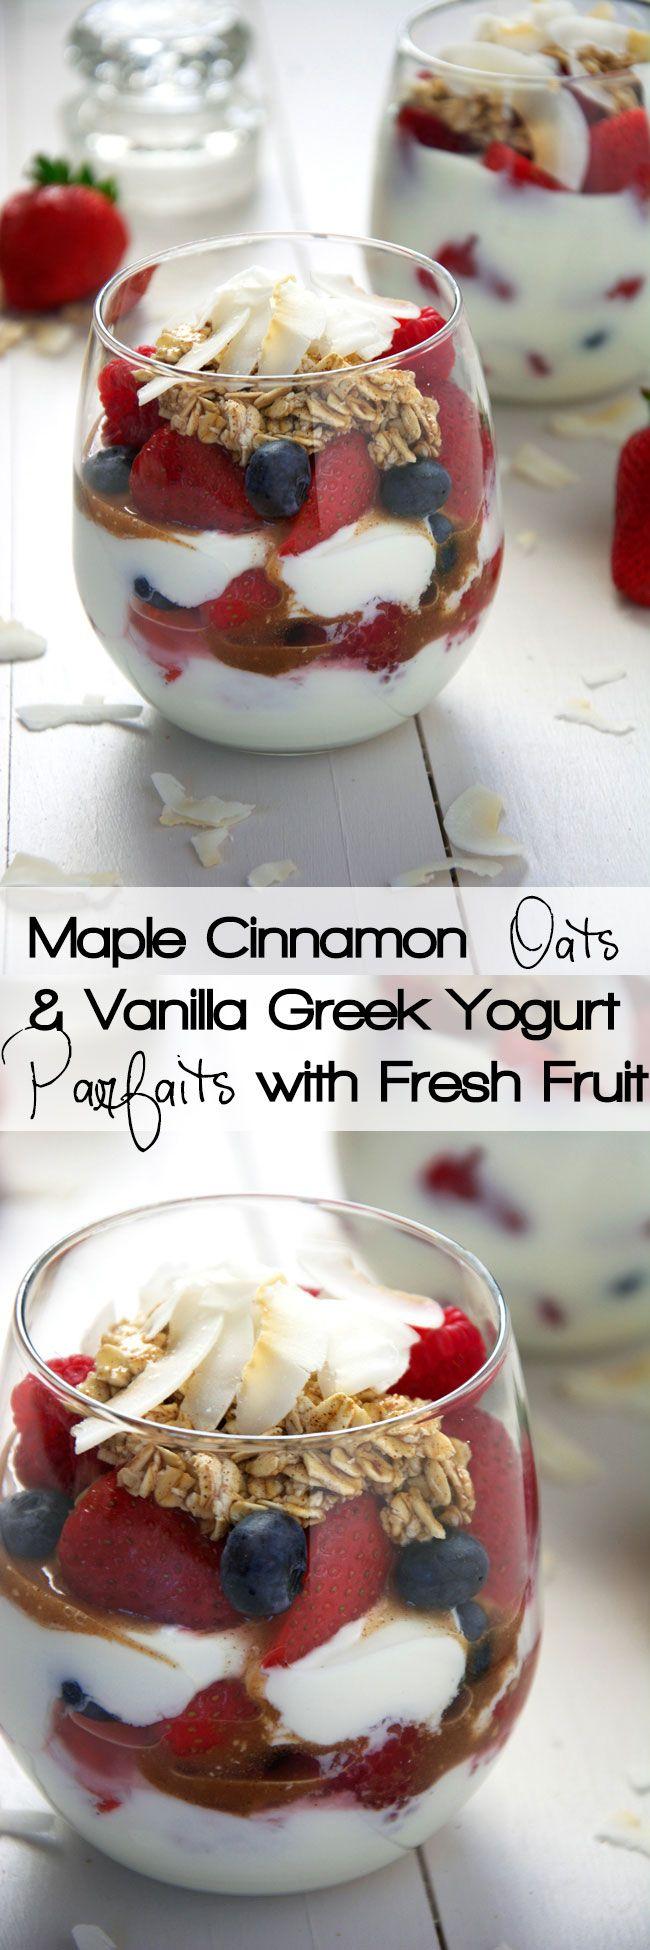 Fresh fruit, cookie dough like maple and cinnamon oats with creamy vanilla yogurt makes this parfait a simple make ahead, no brainer breakfast! | healthy recipe ideas @xhealthyrecipex |